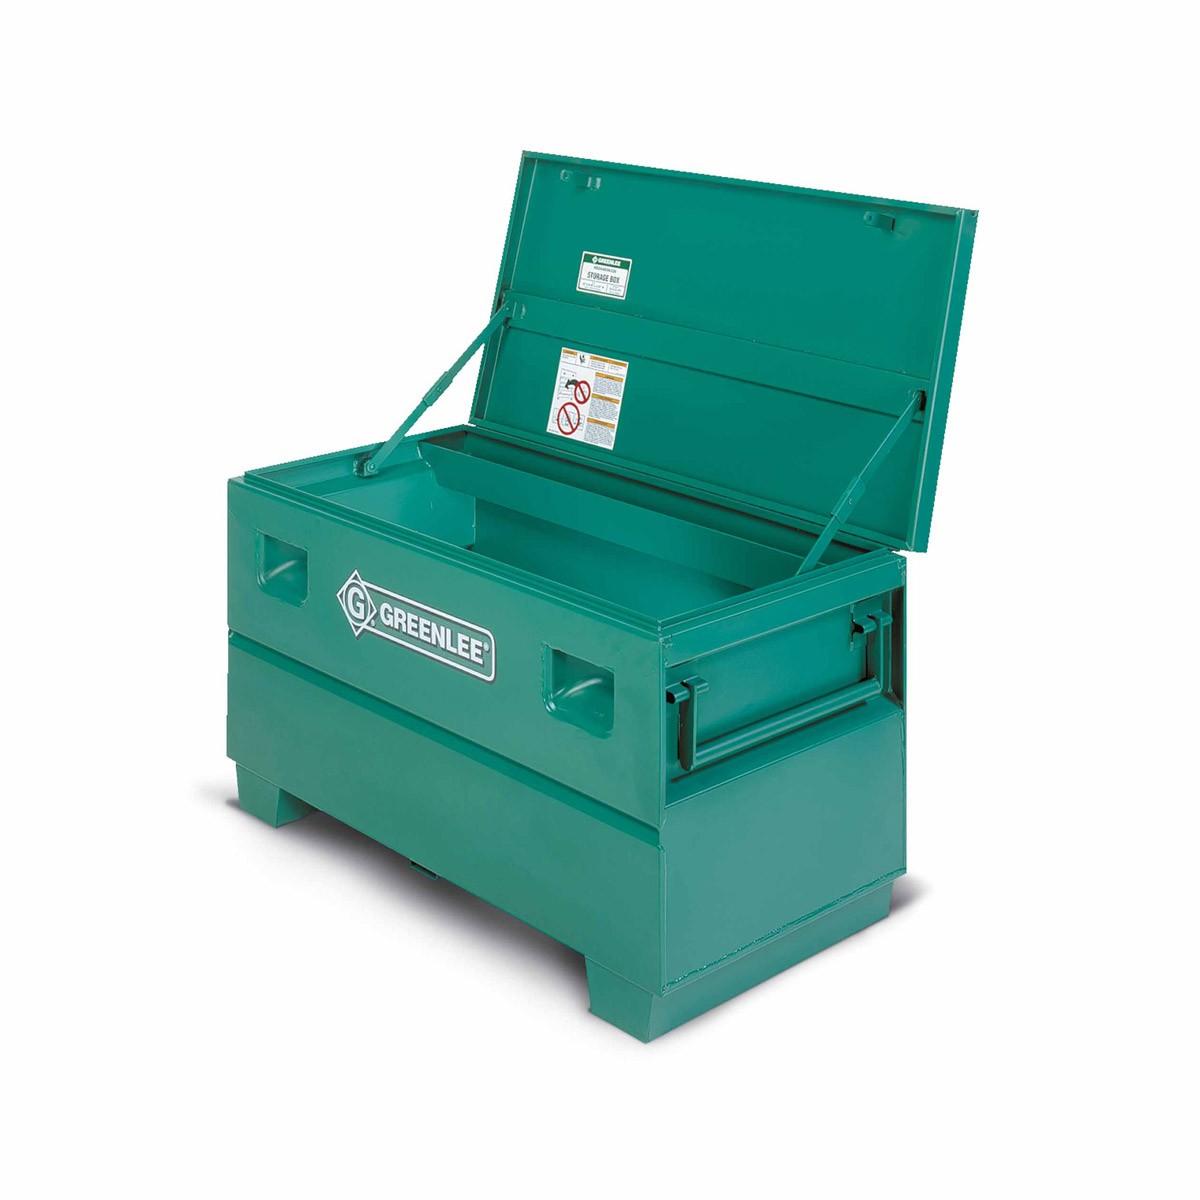 greenlee 2448 mobile storage chest 48 x 24 x 24 for job. Black Bedroom Furniture Sets. Home Design Ideas